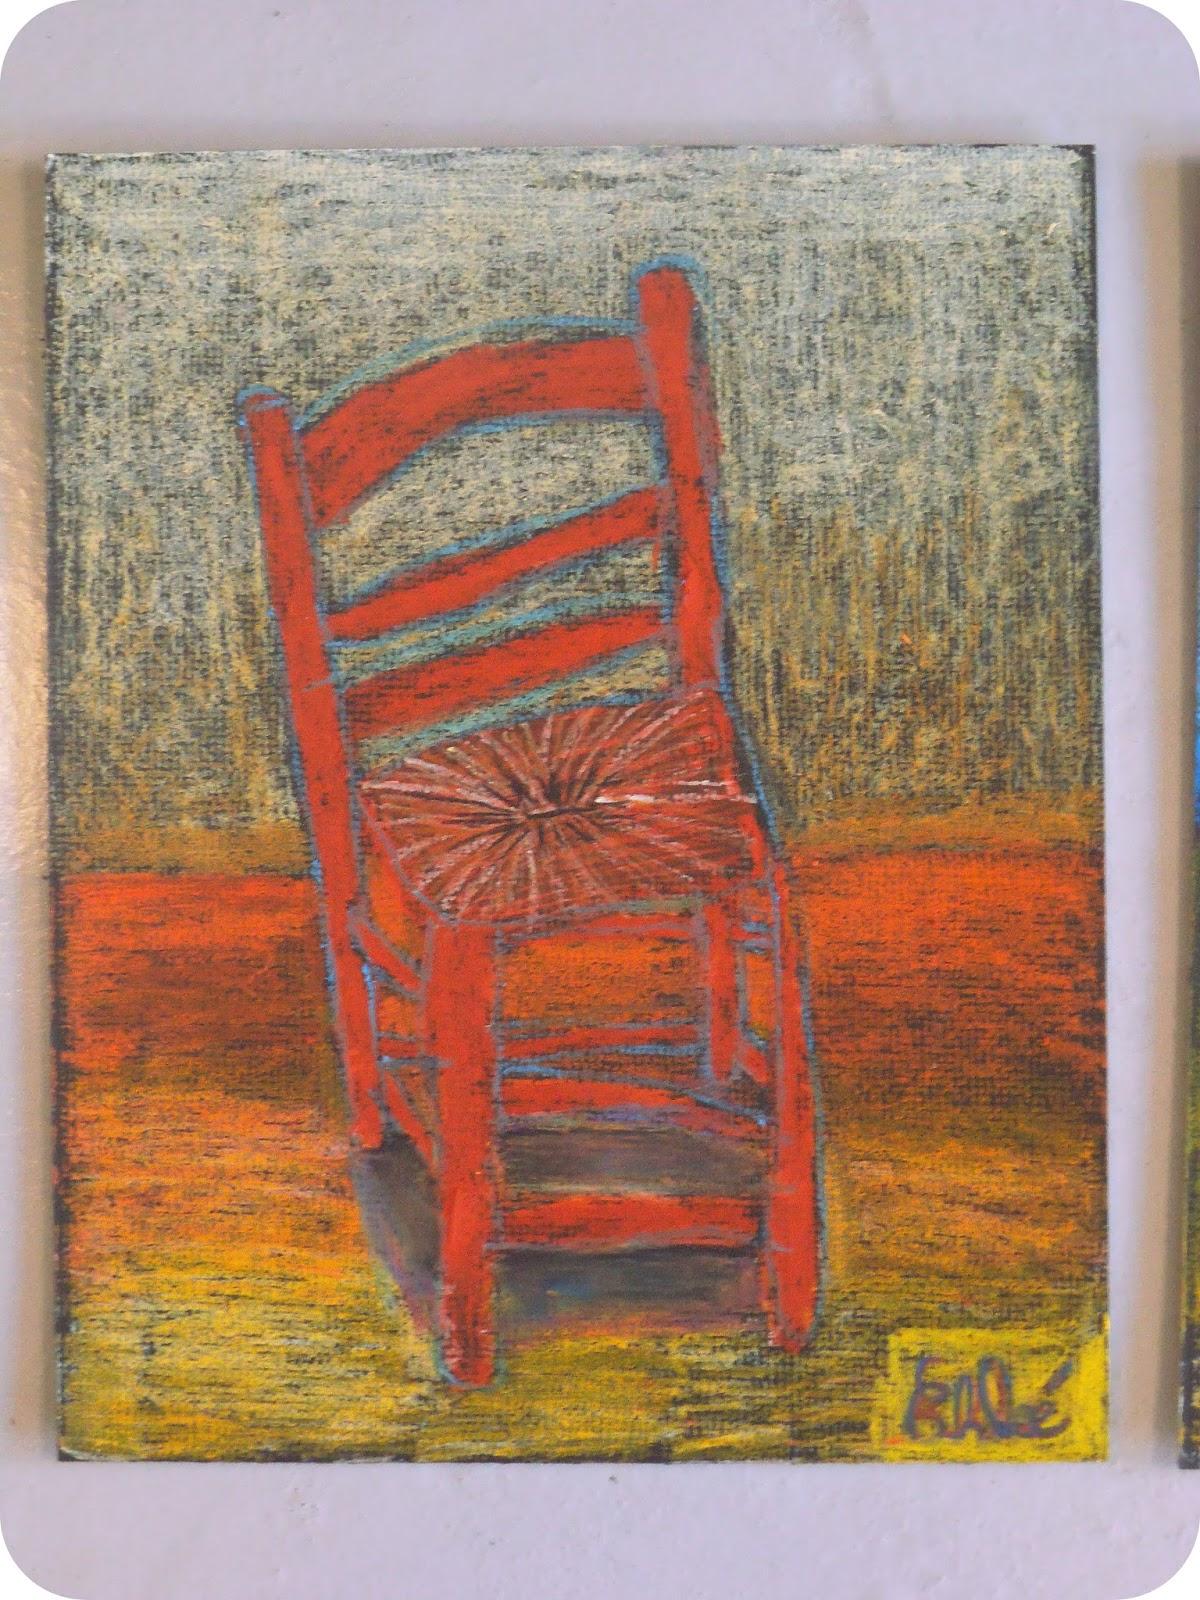 micka lle delam atelier dessin et peinture marmande chaises fa on van gogh. Black Bedroom Furniture Sets. Home Design Ideas